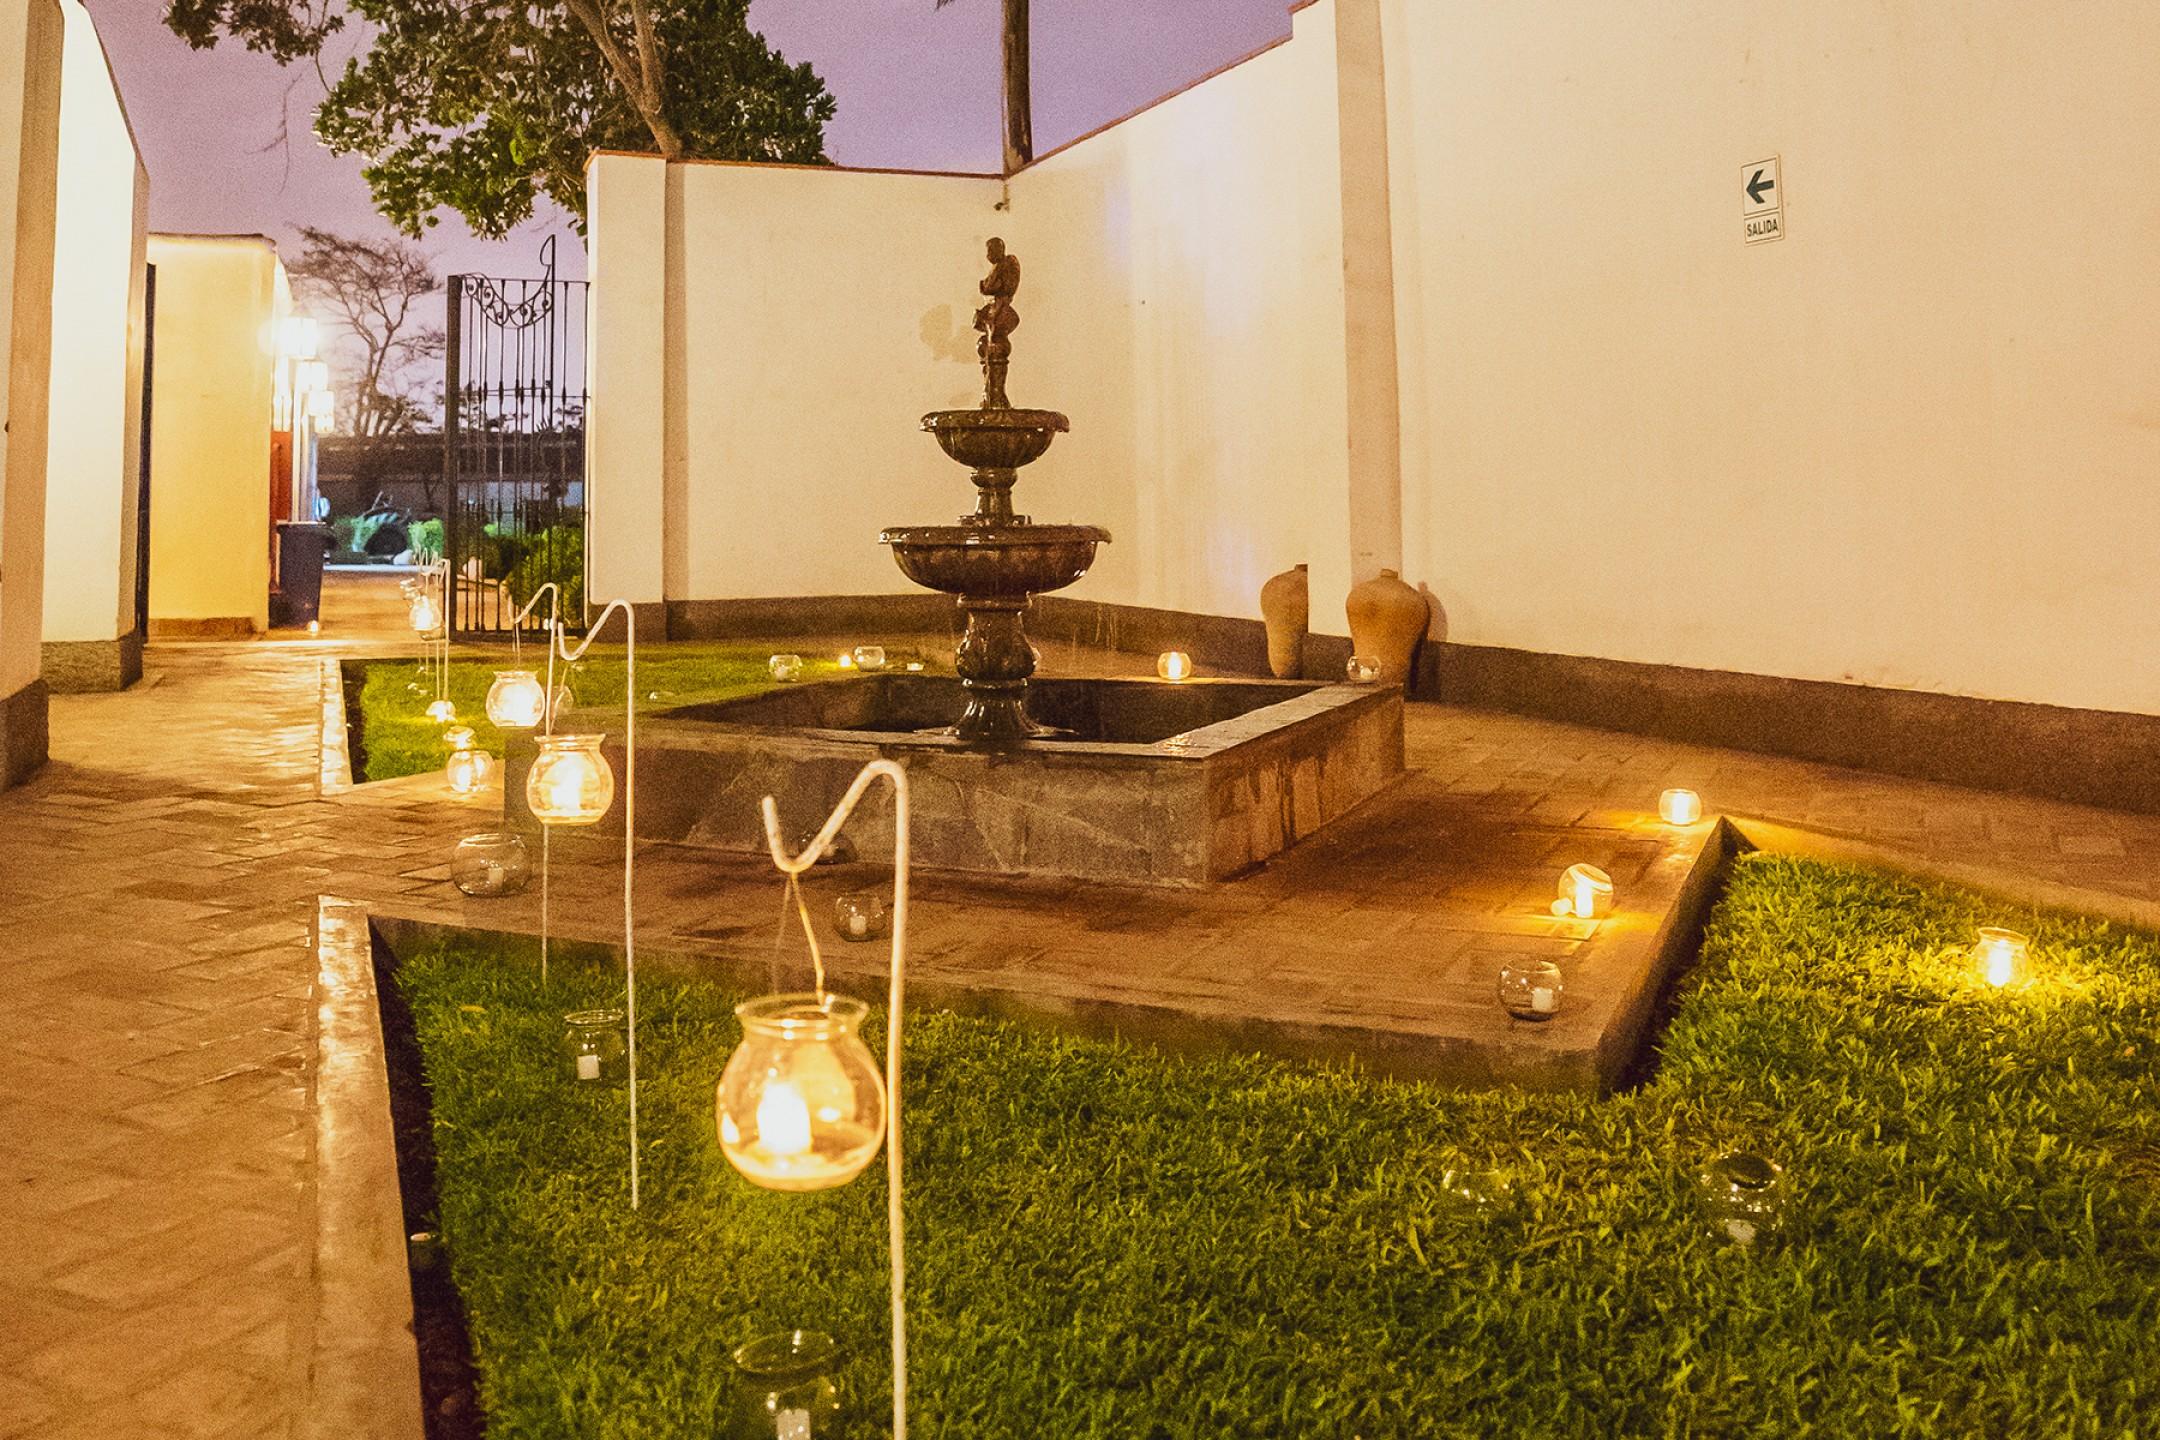 http://haciendabocanegra.com/images/chbn_VFPLGkwgXg_large-1080_bH6tr.jpg